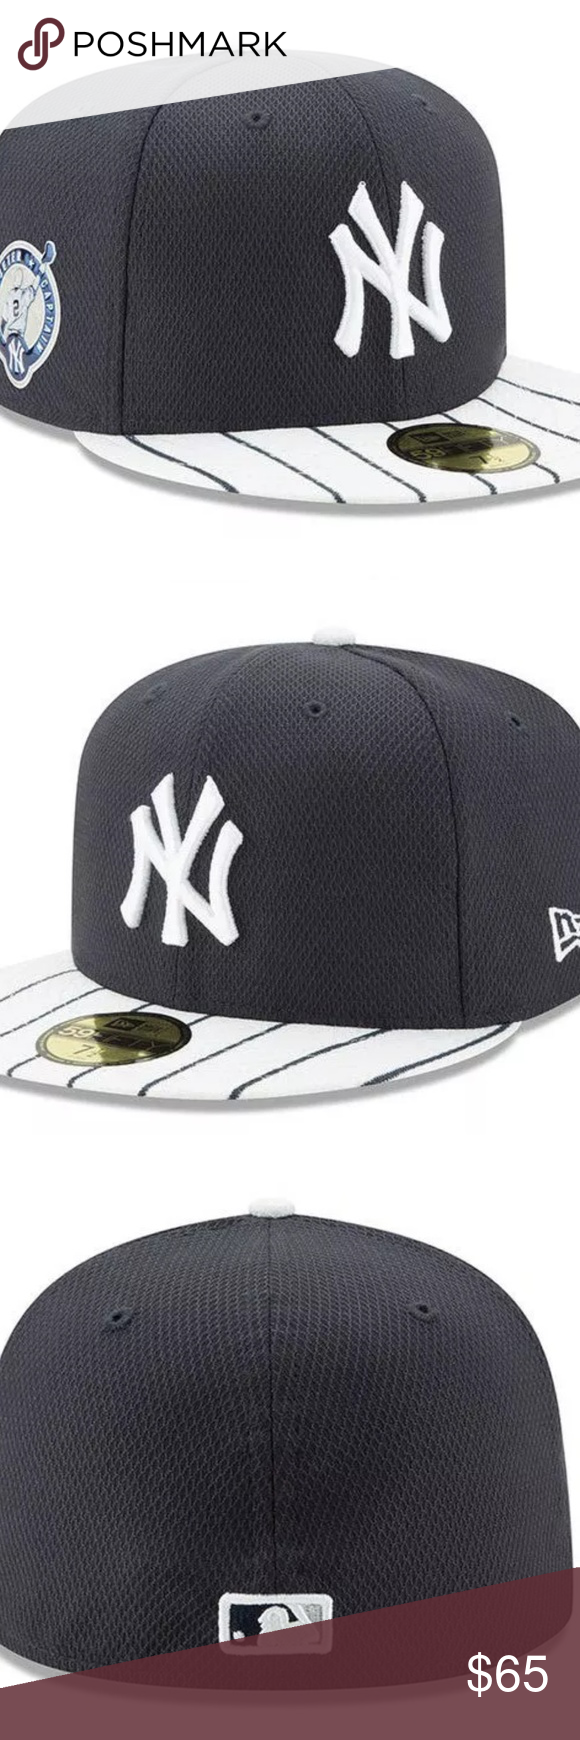 New York Yankees 2017 Derek Jeter Retirement Hat Derek Jeter New York Yankees New Era 59fifty